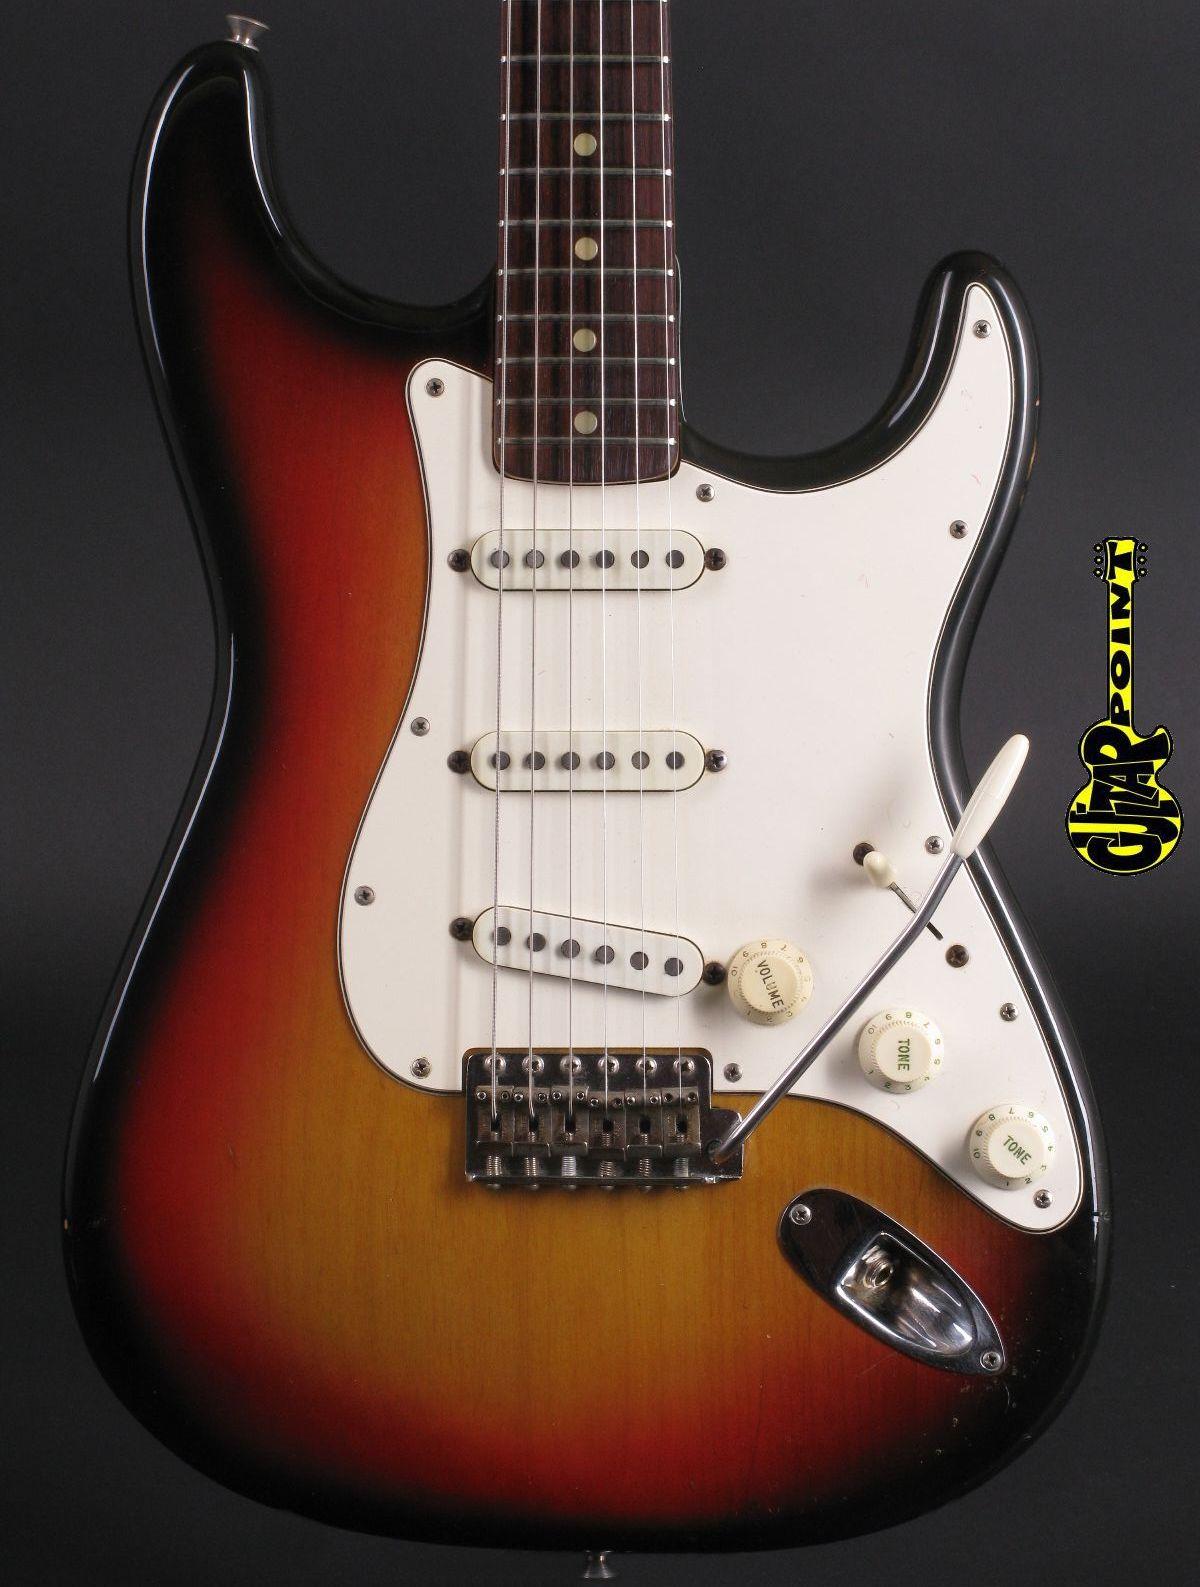 1971 Fender Stratocaster - 3-tone Sunburst incl. Case.